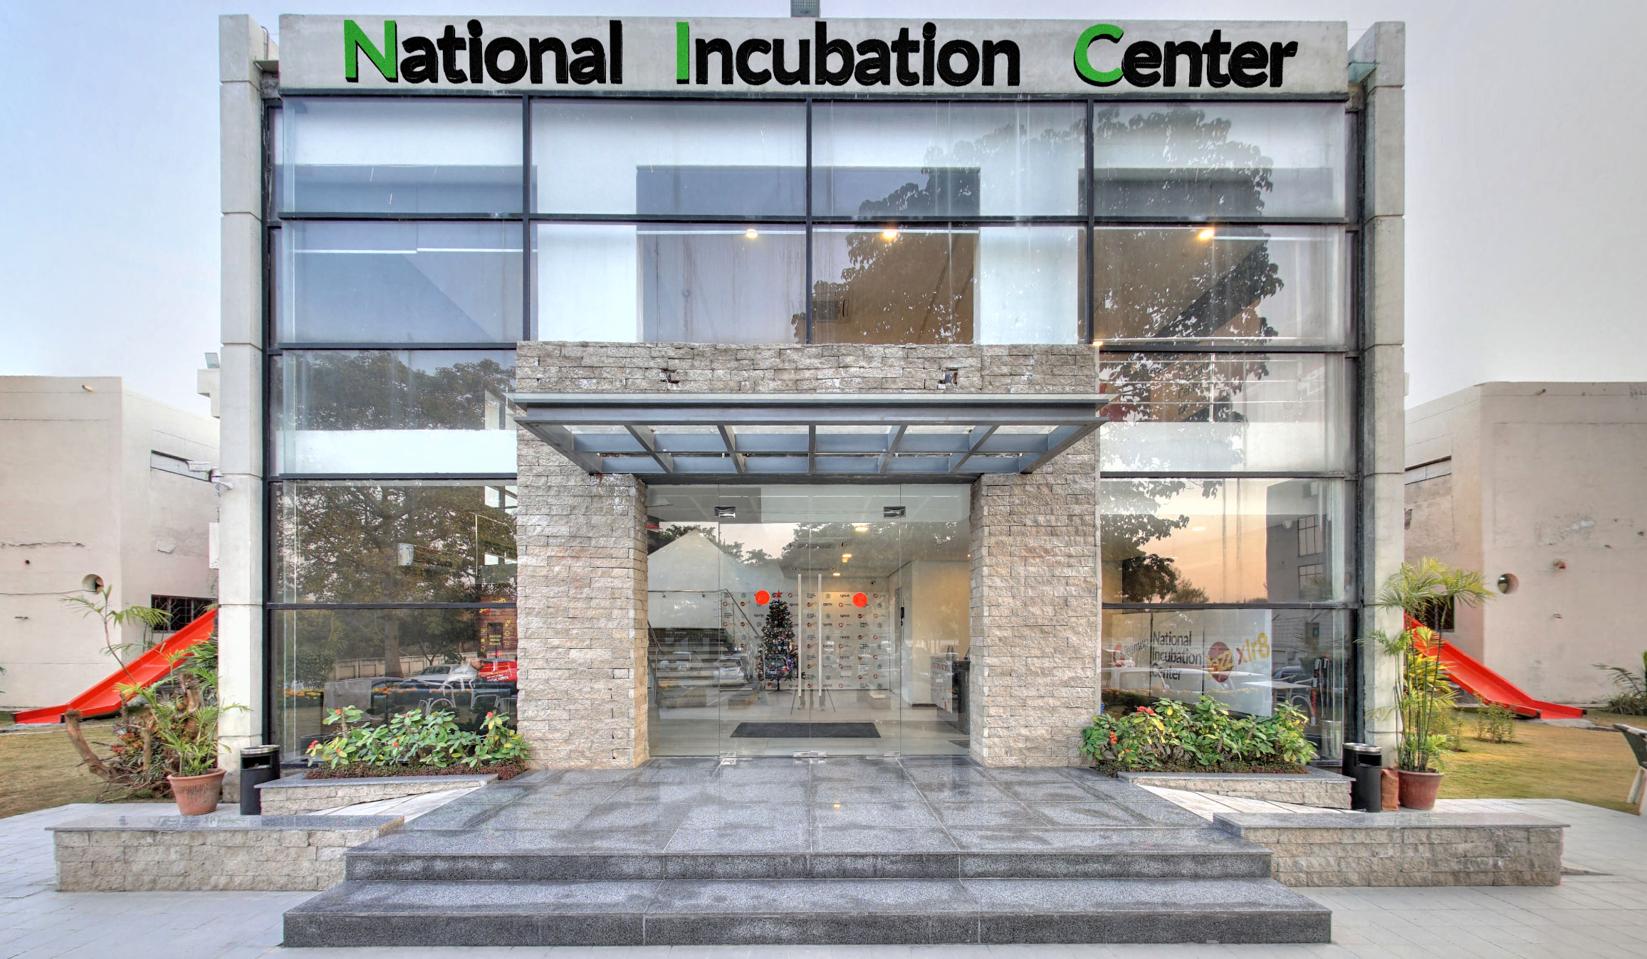 national incubation center